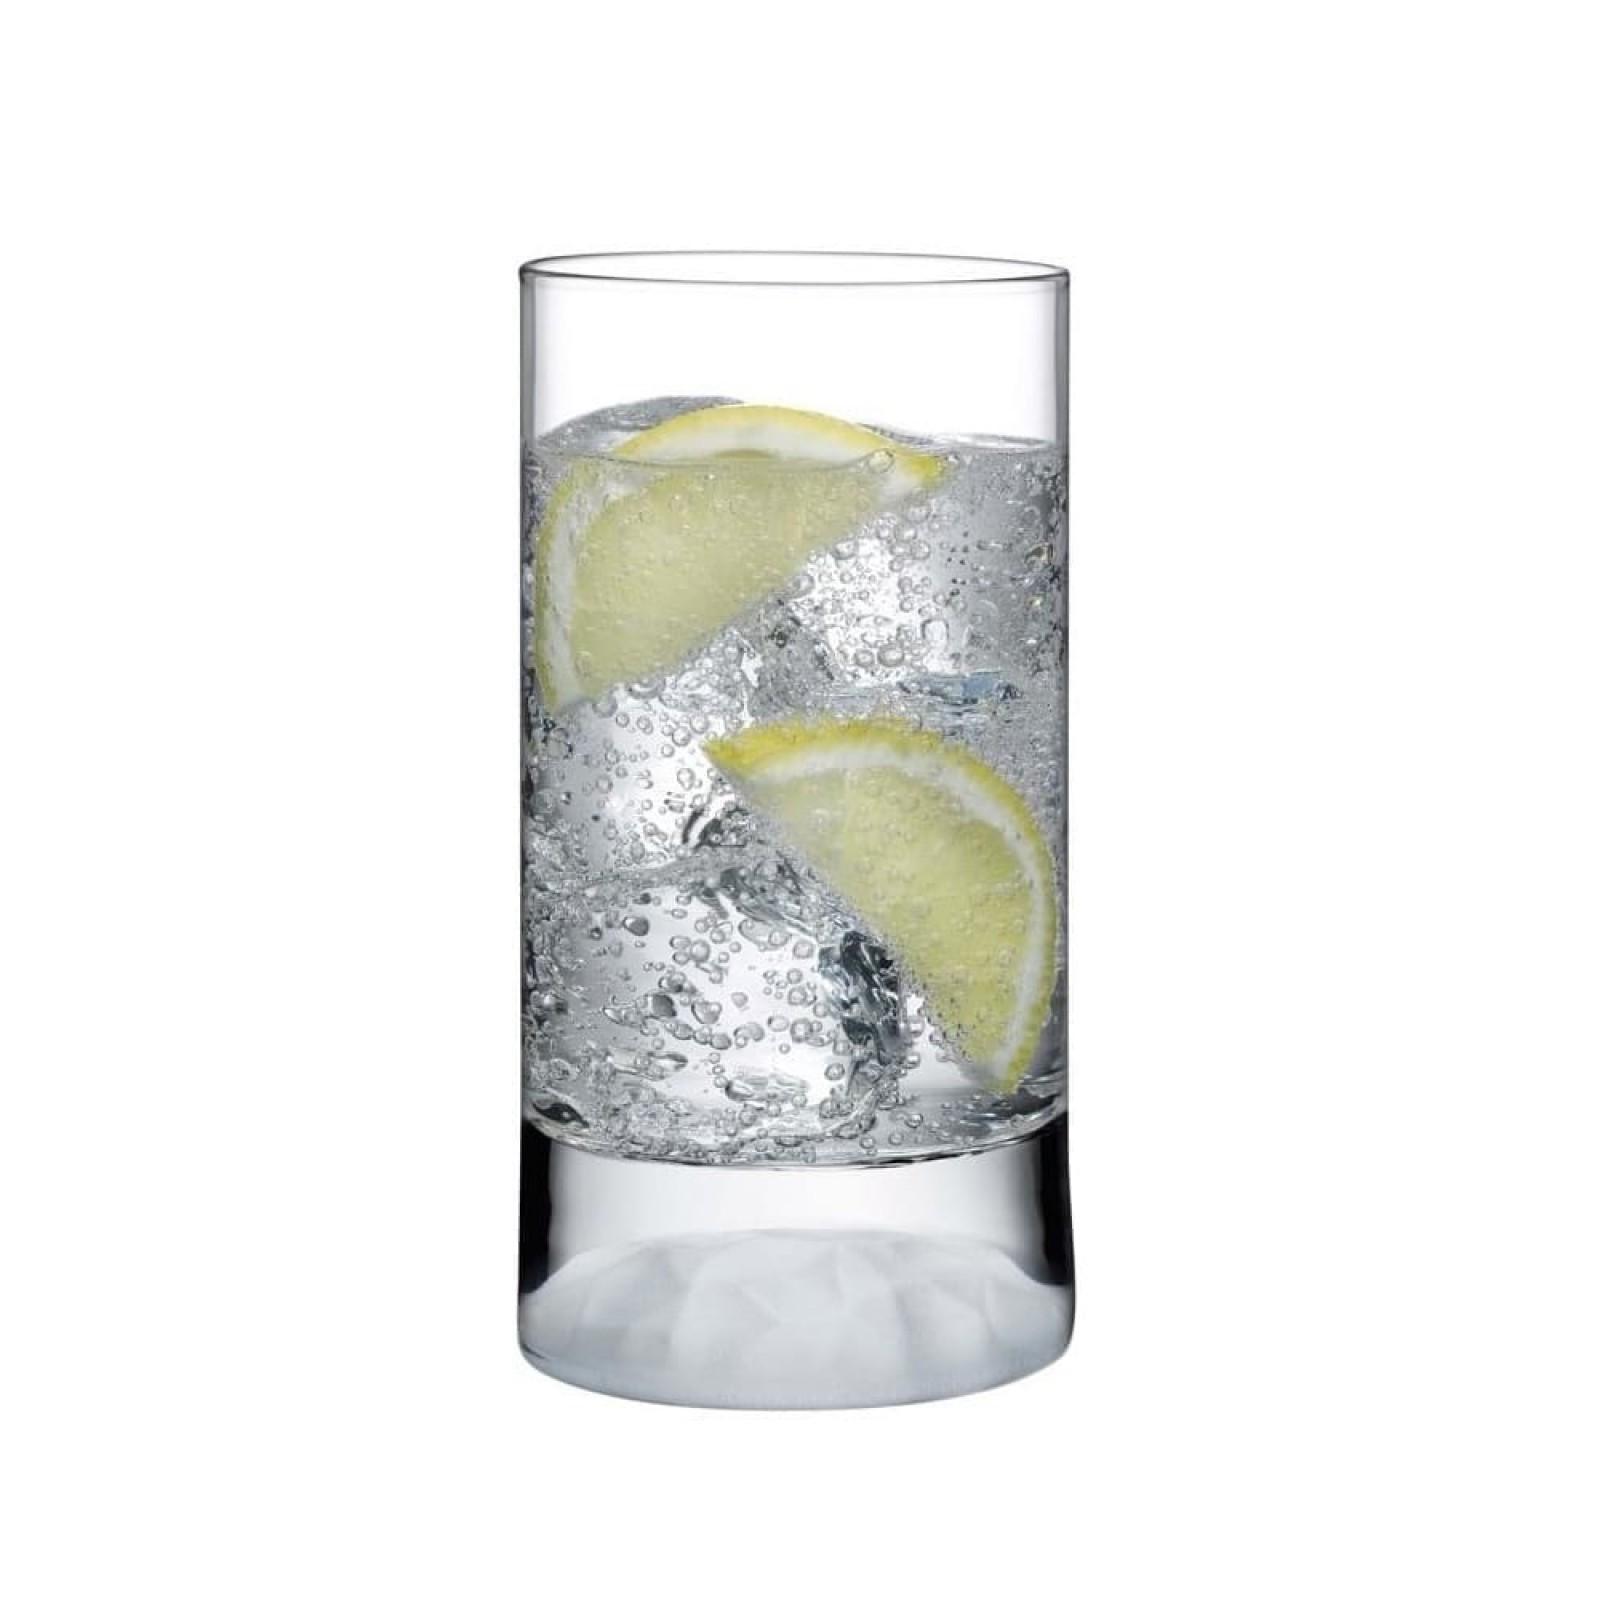 Club Ice High Ball Glasses 280 ml. (Set of 4) - Nude Glass